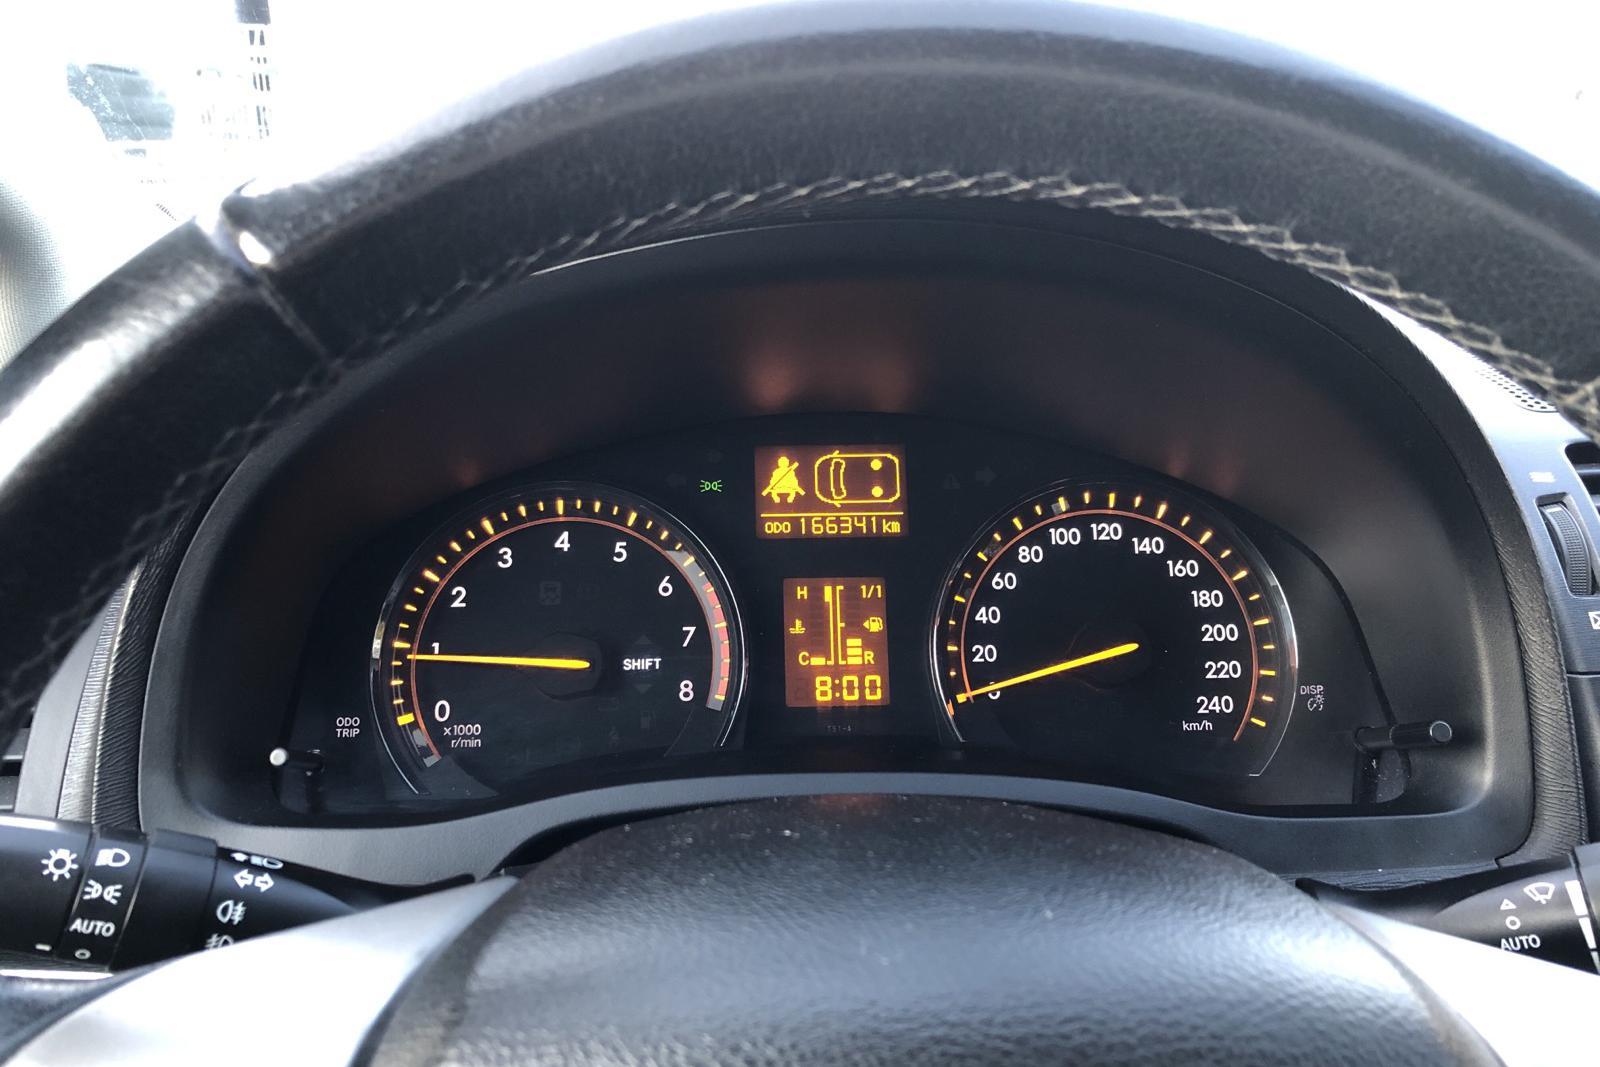 Toyota Avensis 2.0 Kombi (152hk) - 16 600 mil - Manuell - grå - 2009